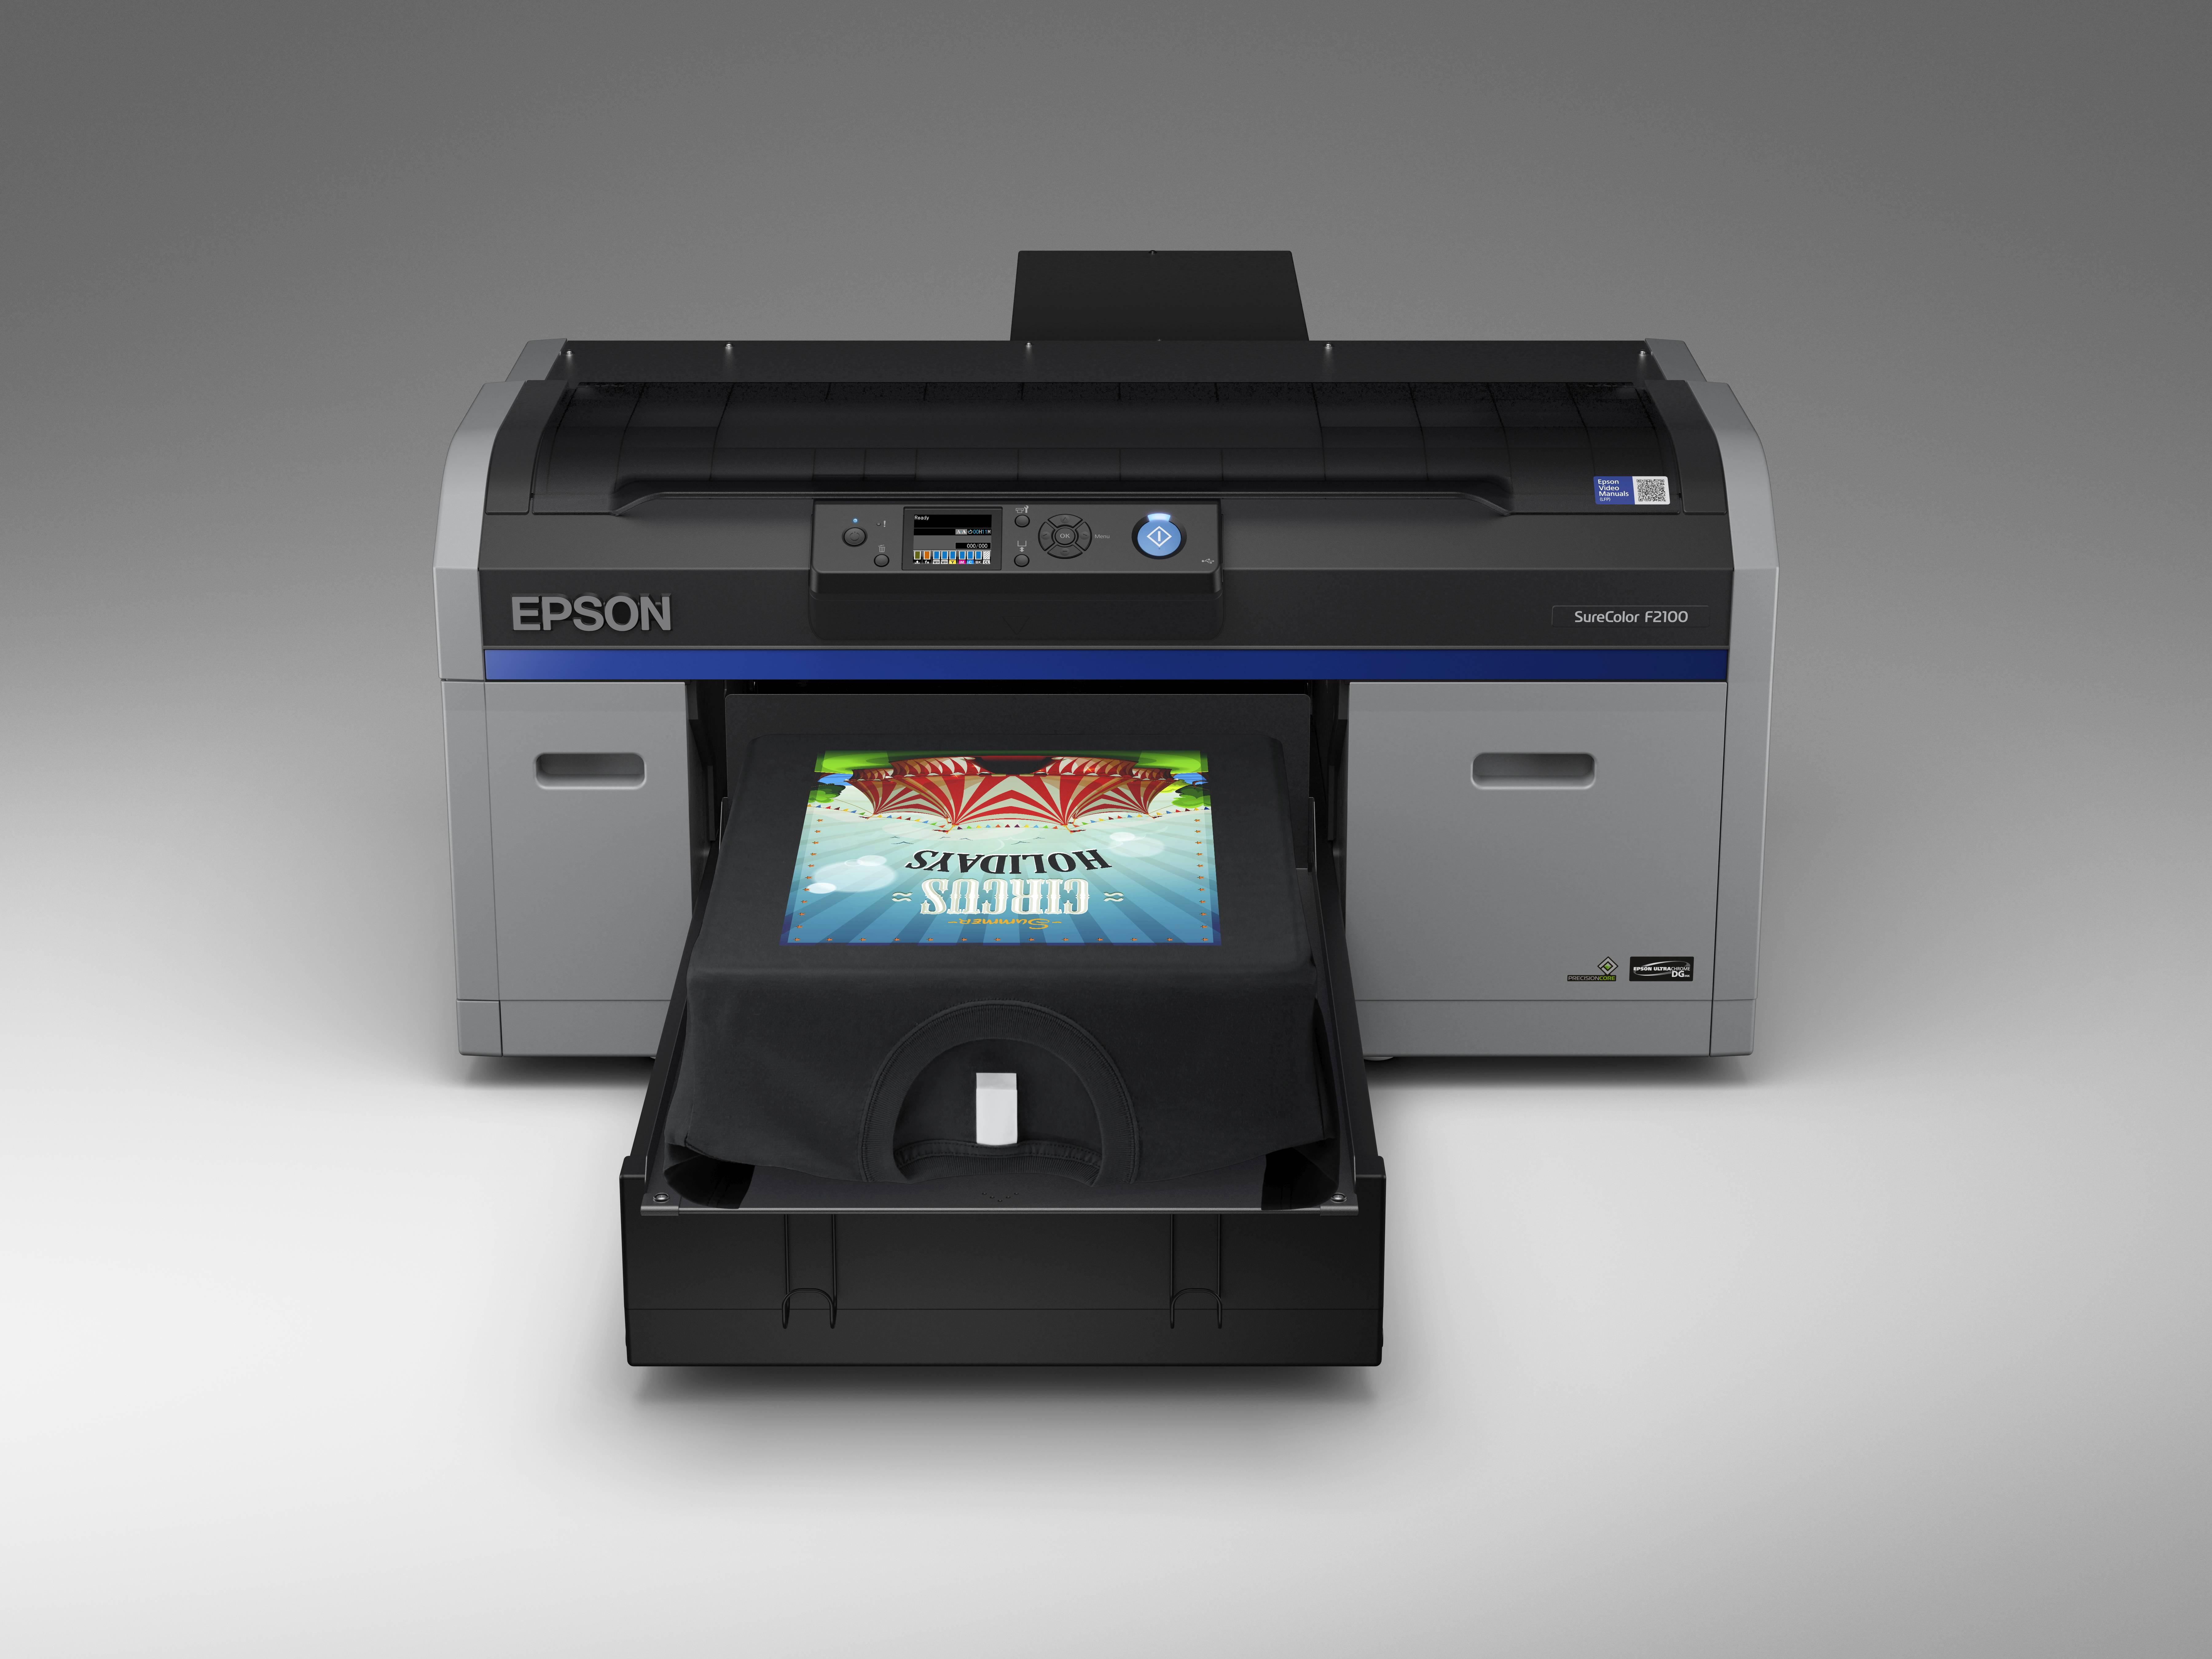 Ogromny Epson SureColor SC-F2100 - nowa drukarka do koszulek - Swiatobrazu.pl TB51